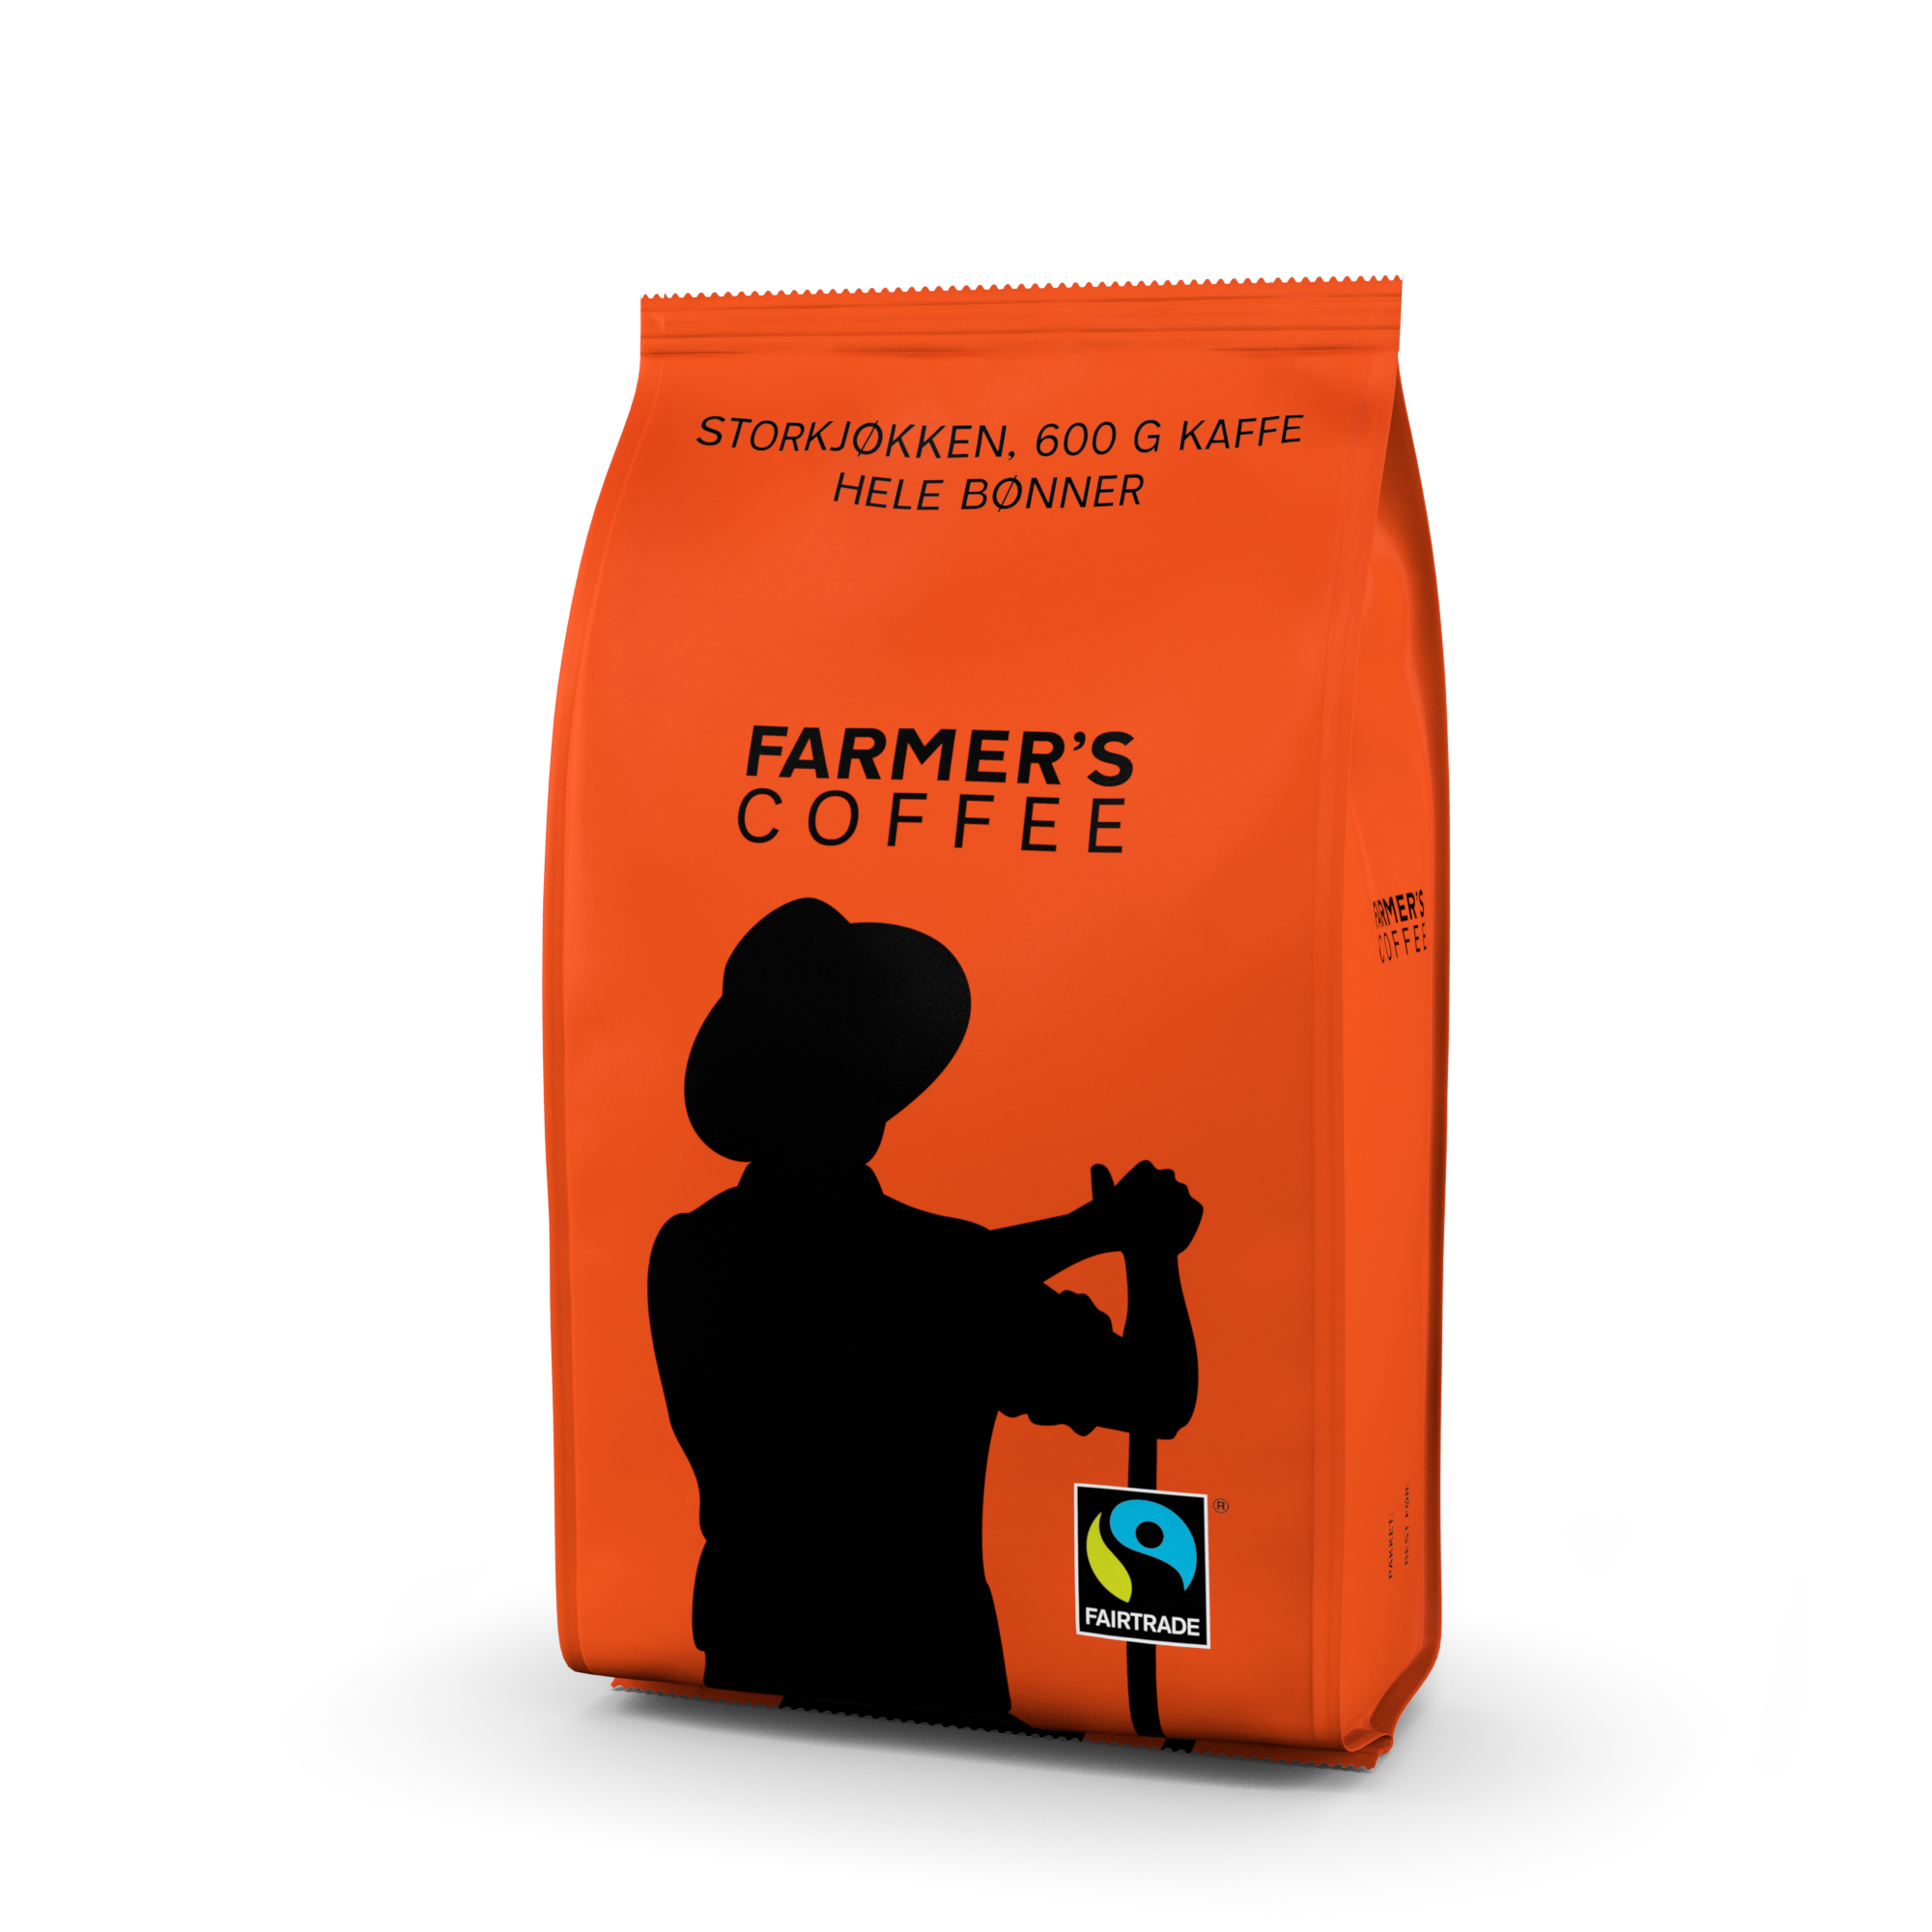 1738400_Farmers_Hel_600g_0001